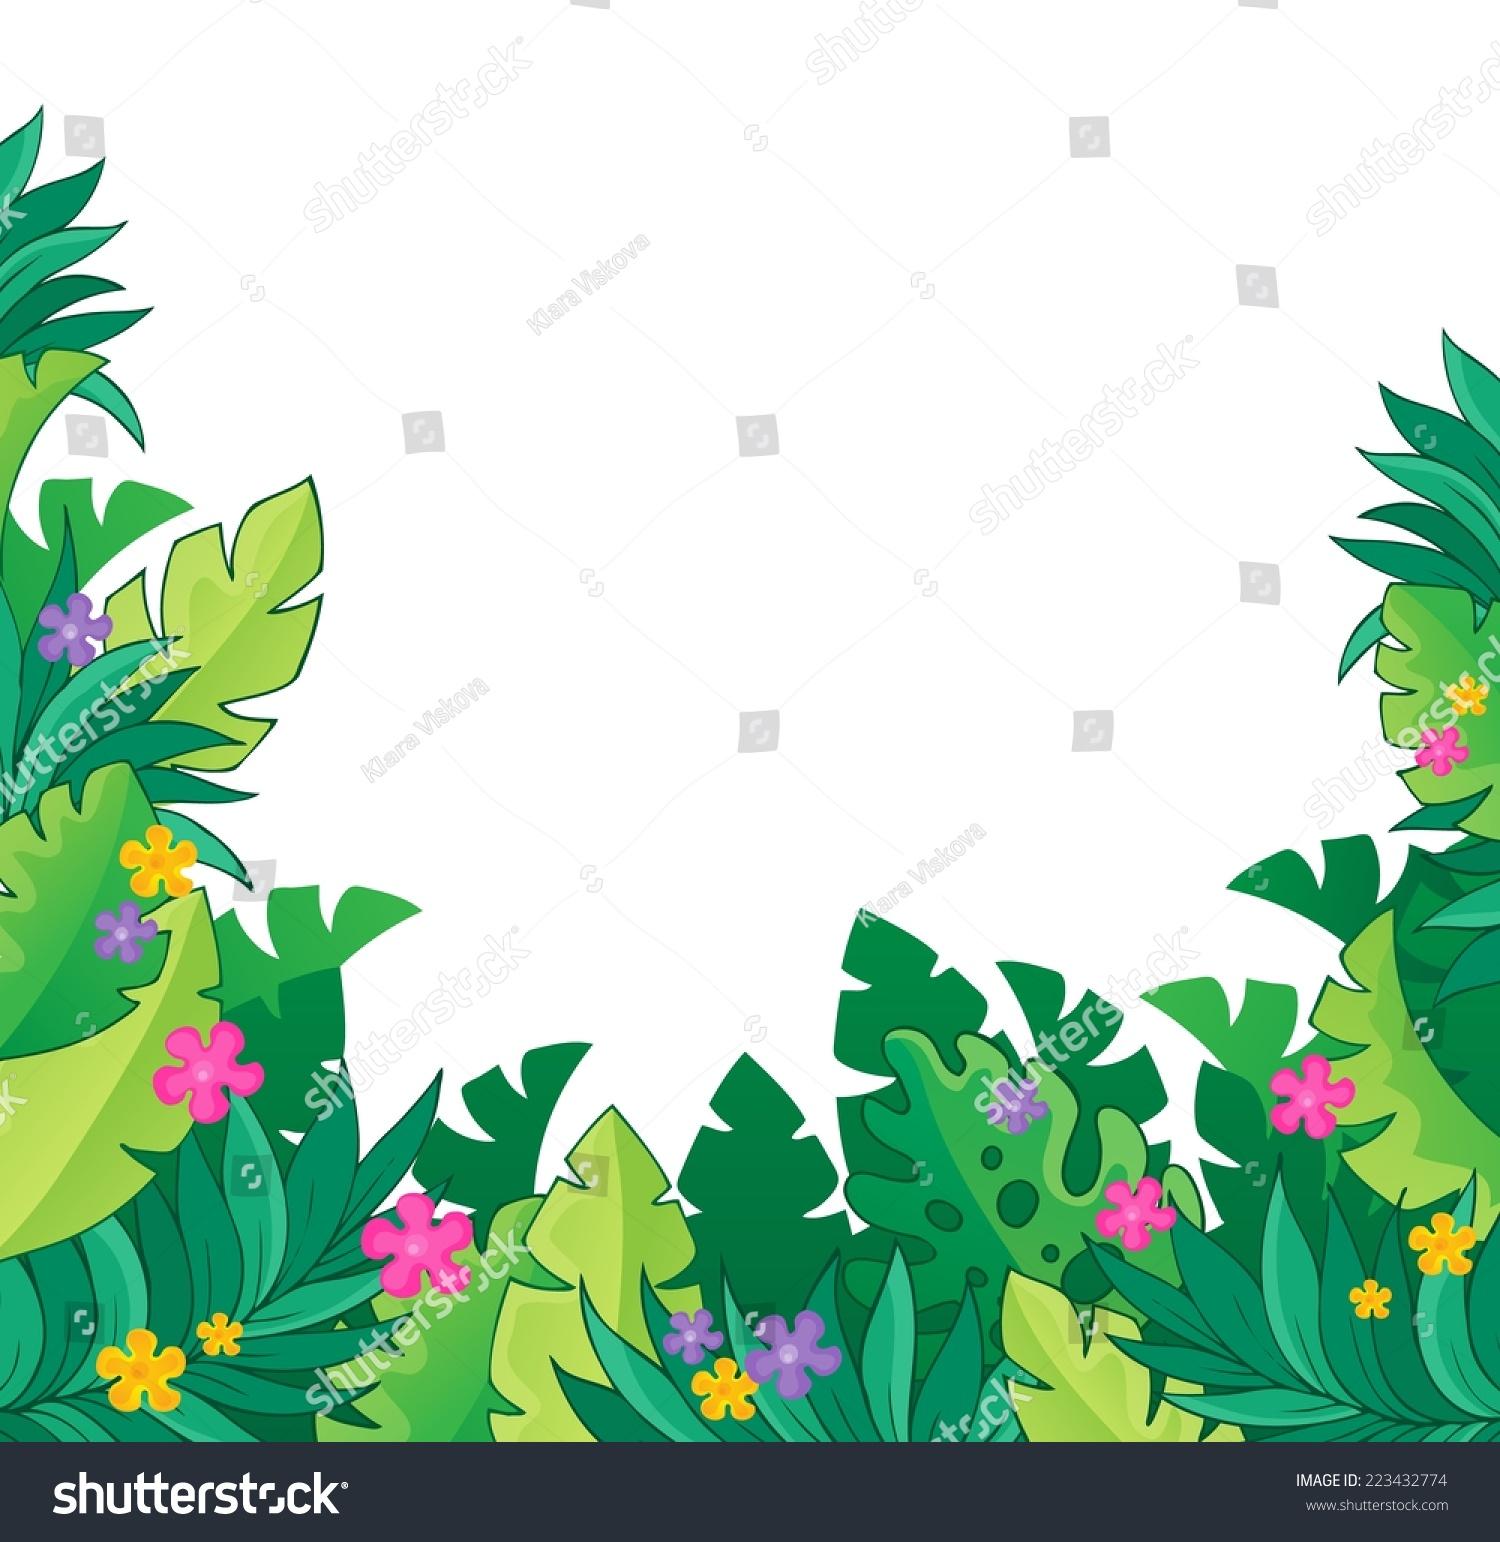 image jungle theme 7 eps 10 vector stock vector 223432774 shutterstock rh shutterstock com jungle vector free download jungle vector free download